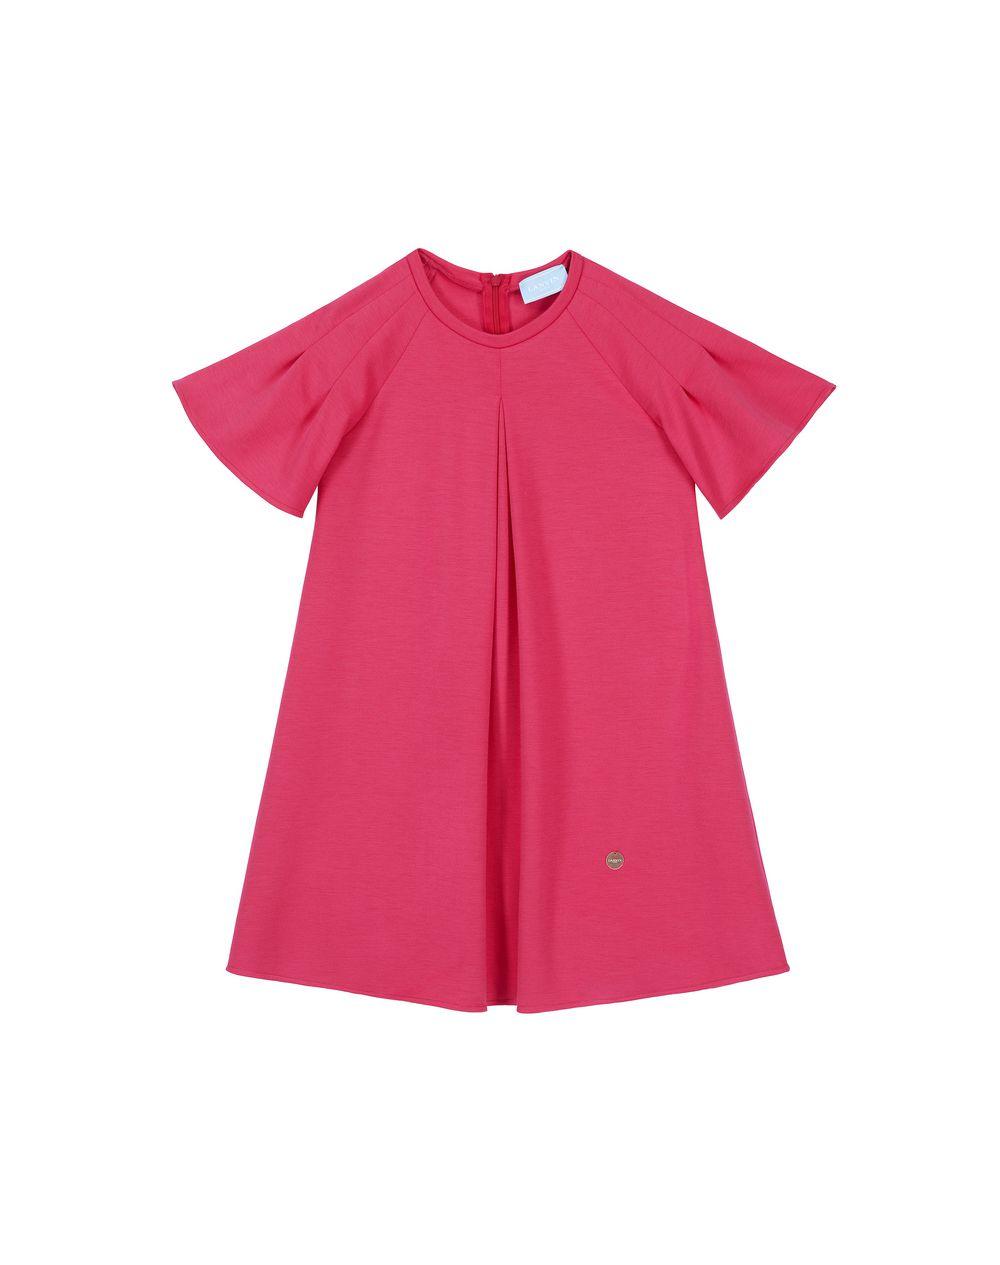 Lanvin Fuchsia Dress Dress Childrenswear Women